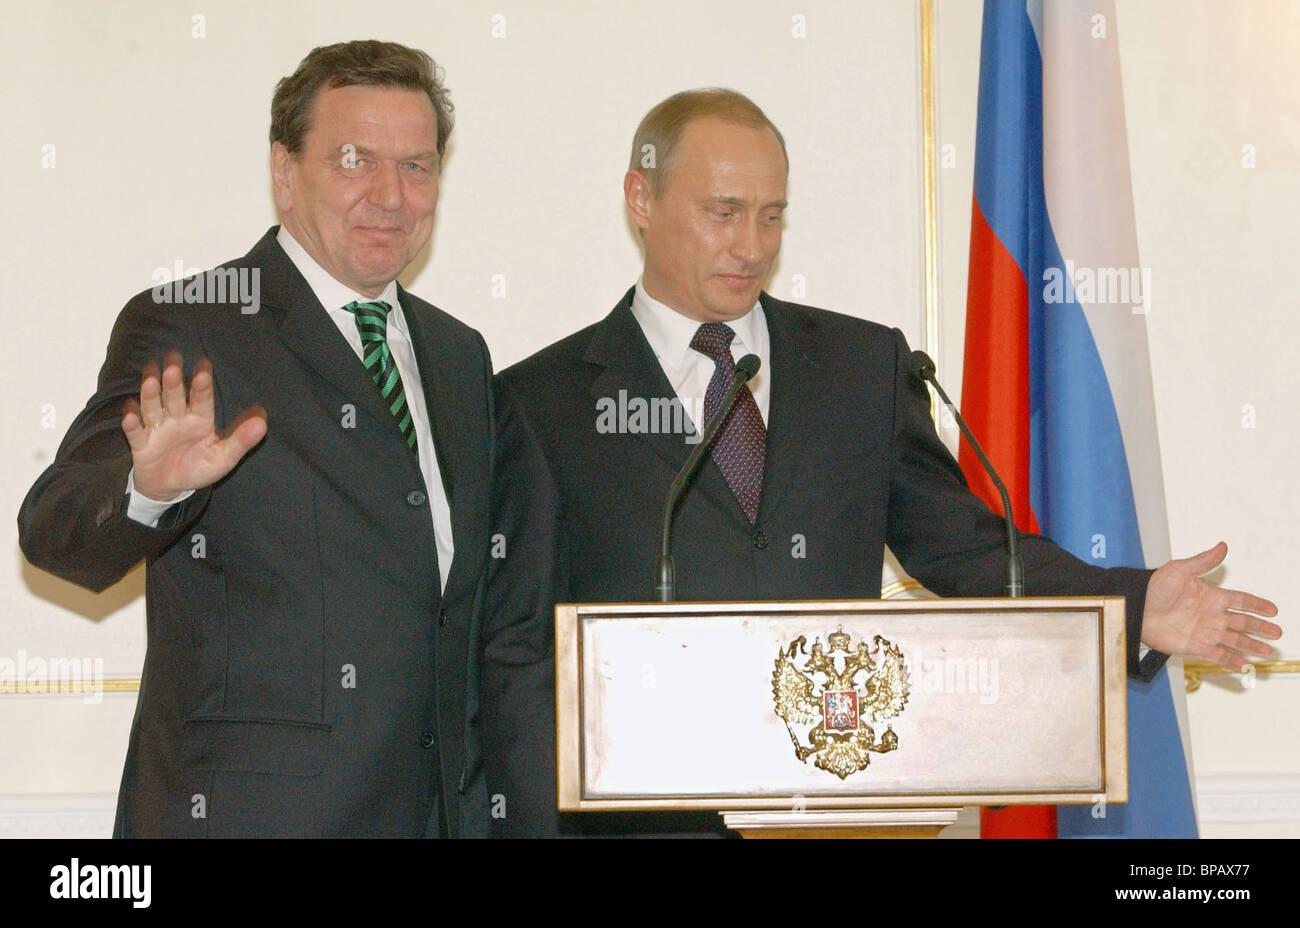 Meeting of President of Russia Vladimir Putin with German Chancellor Gerhard Schroeder - Stock Image